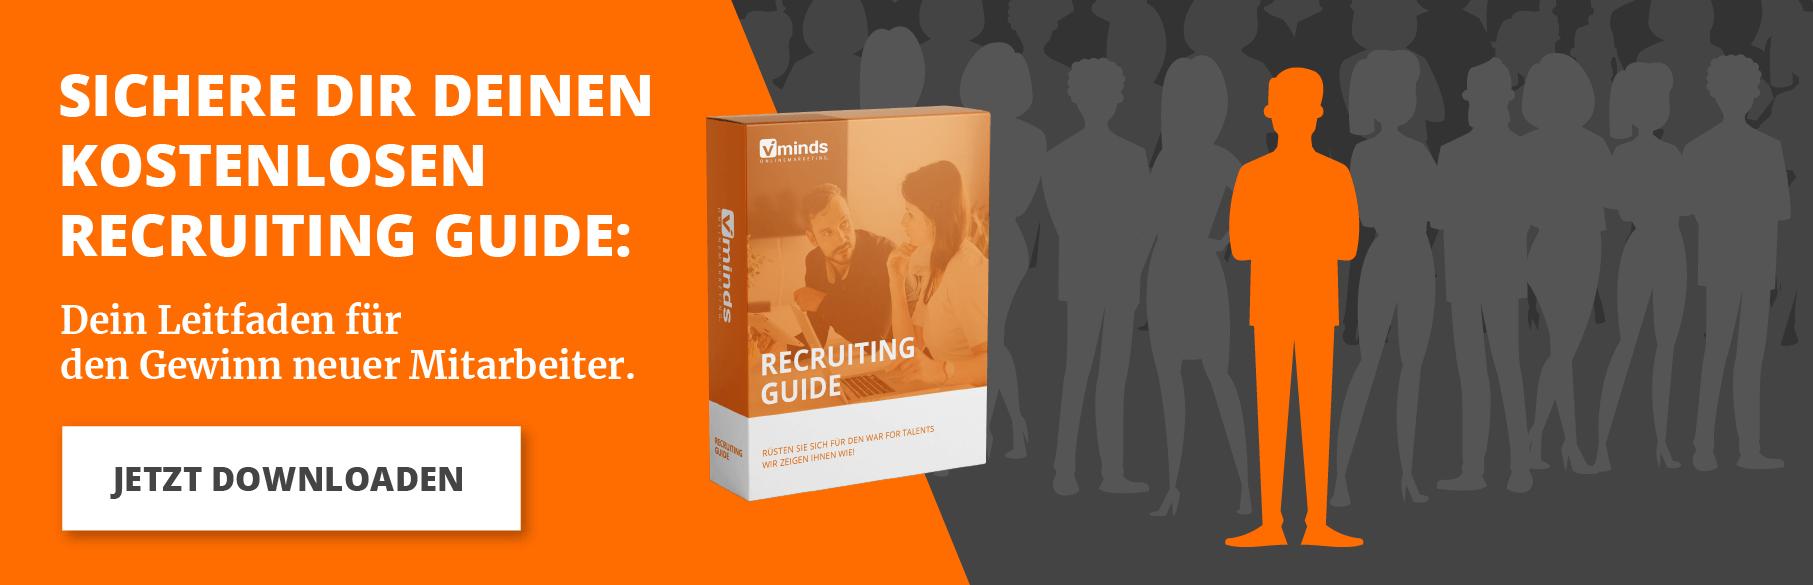 Recruiting Guide anfordern